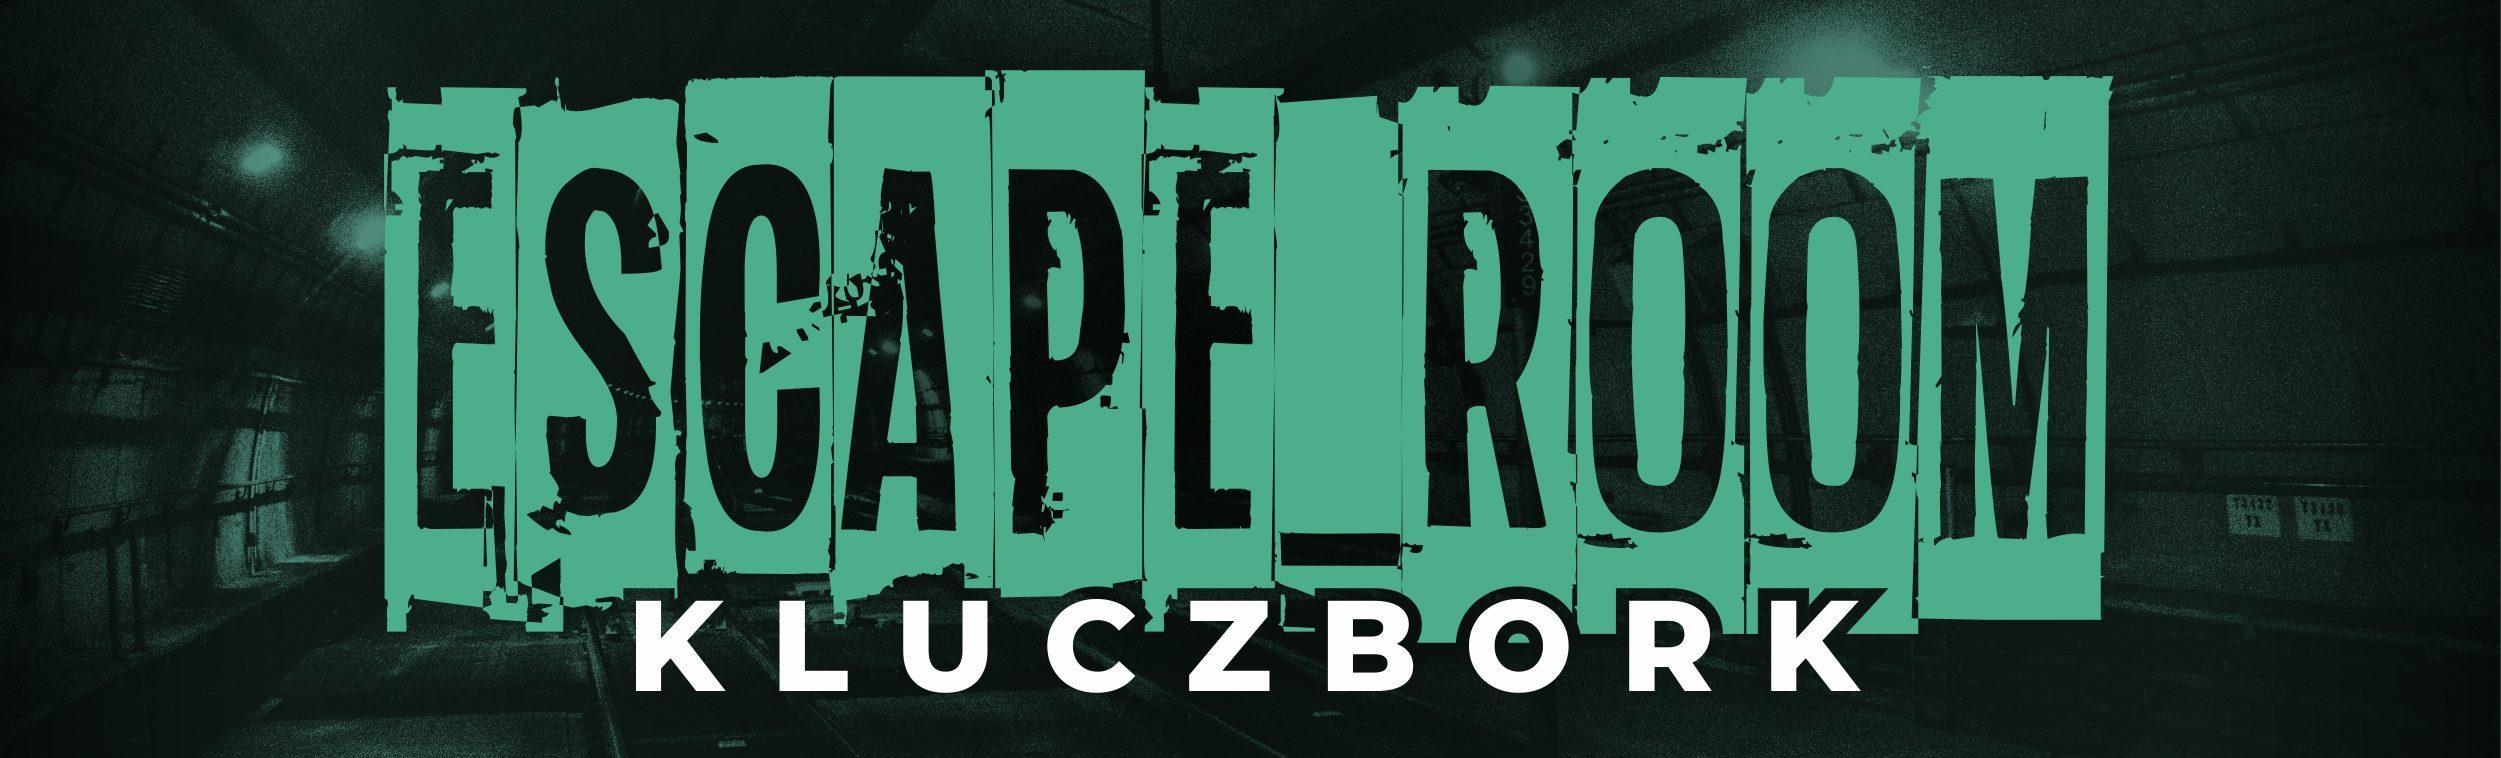 "Escape Room Kluczbork ""Anna-logia"""